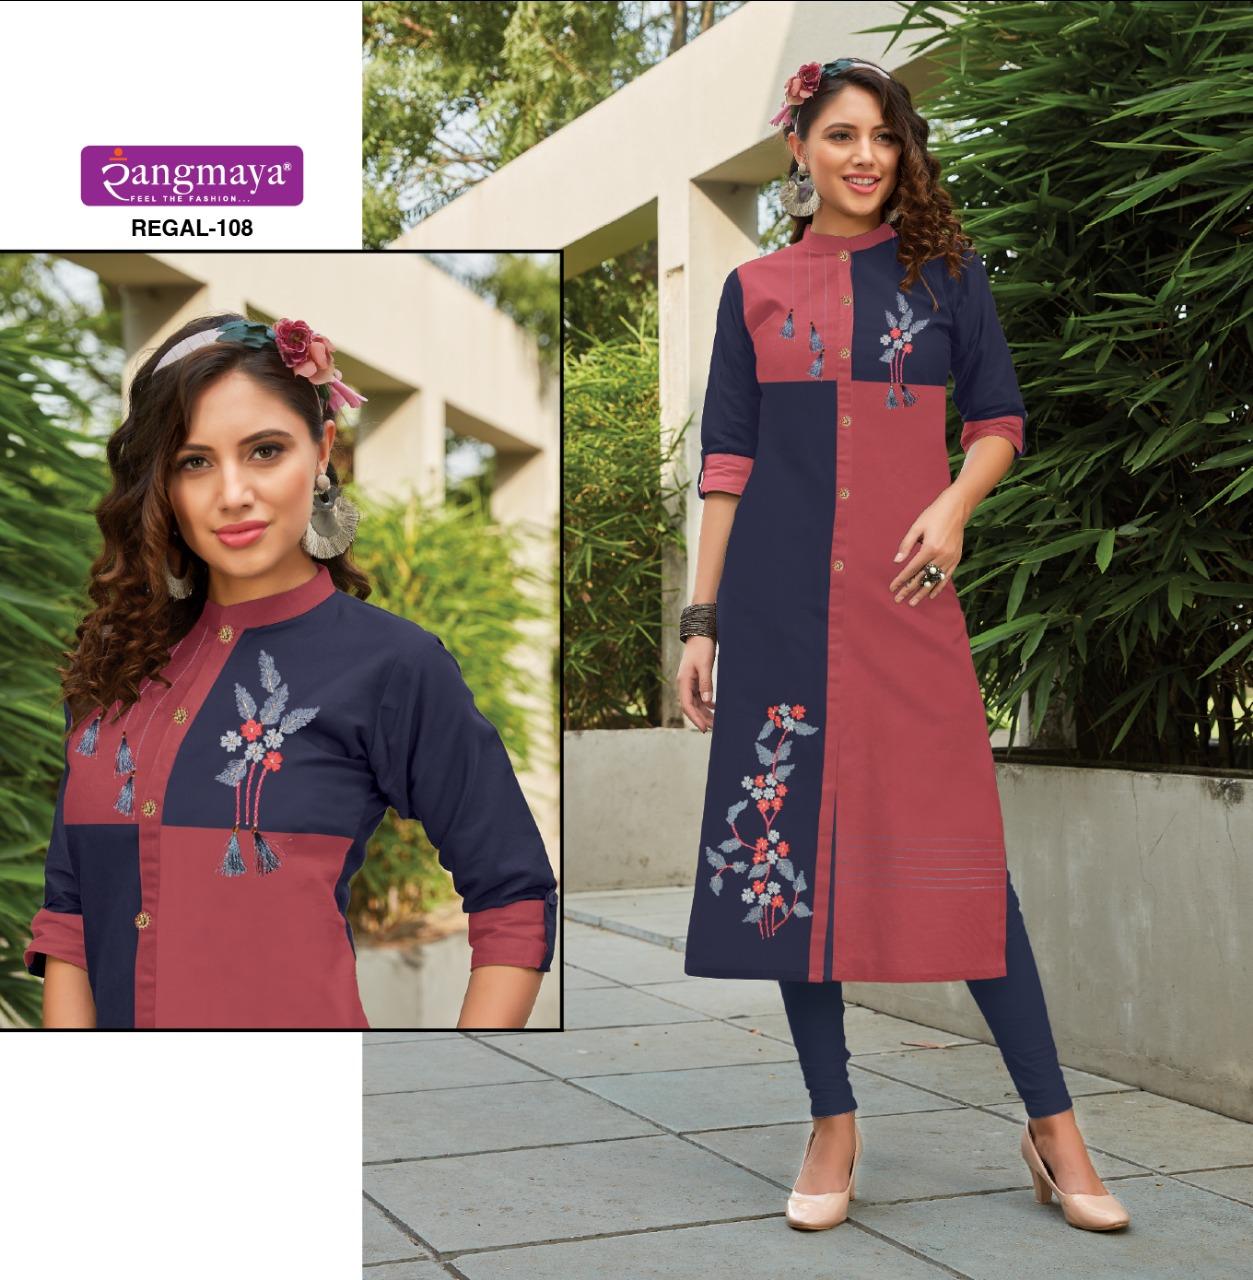 Rangmaya Regal Designer Latest & Western Kurties Wholesale Surat